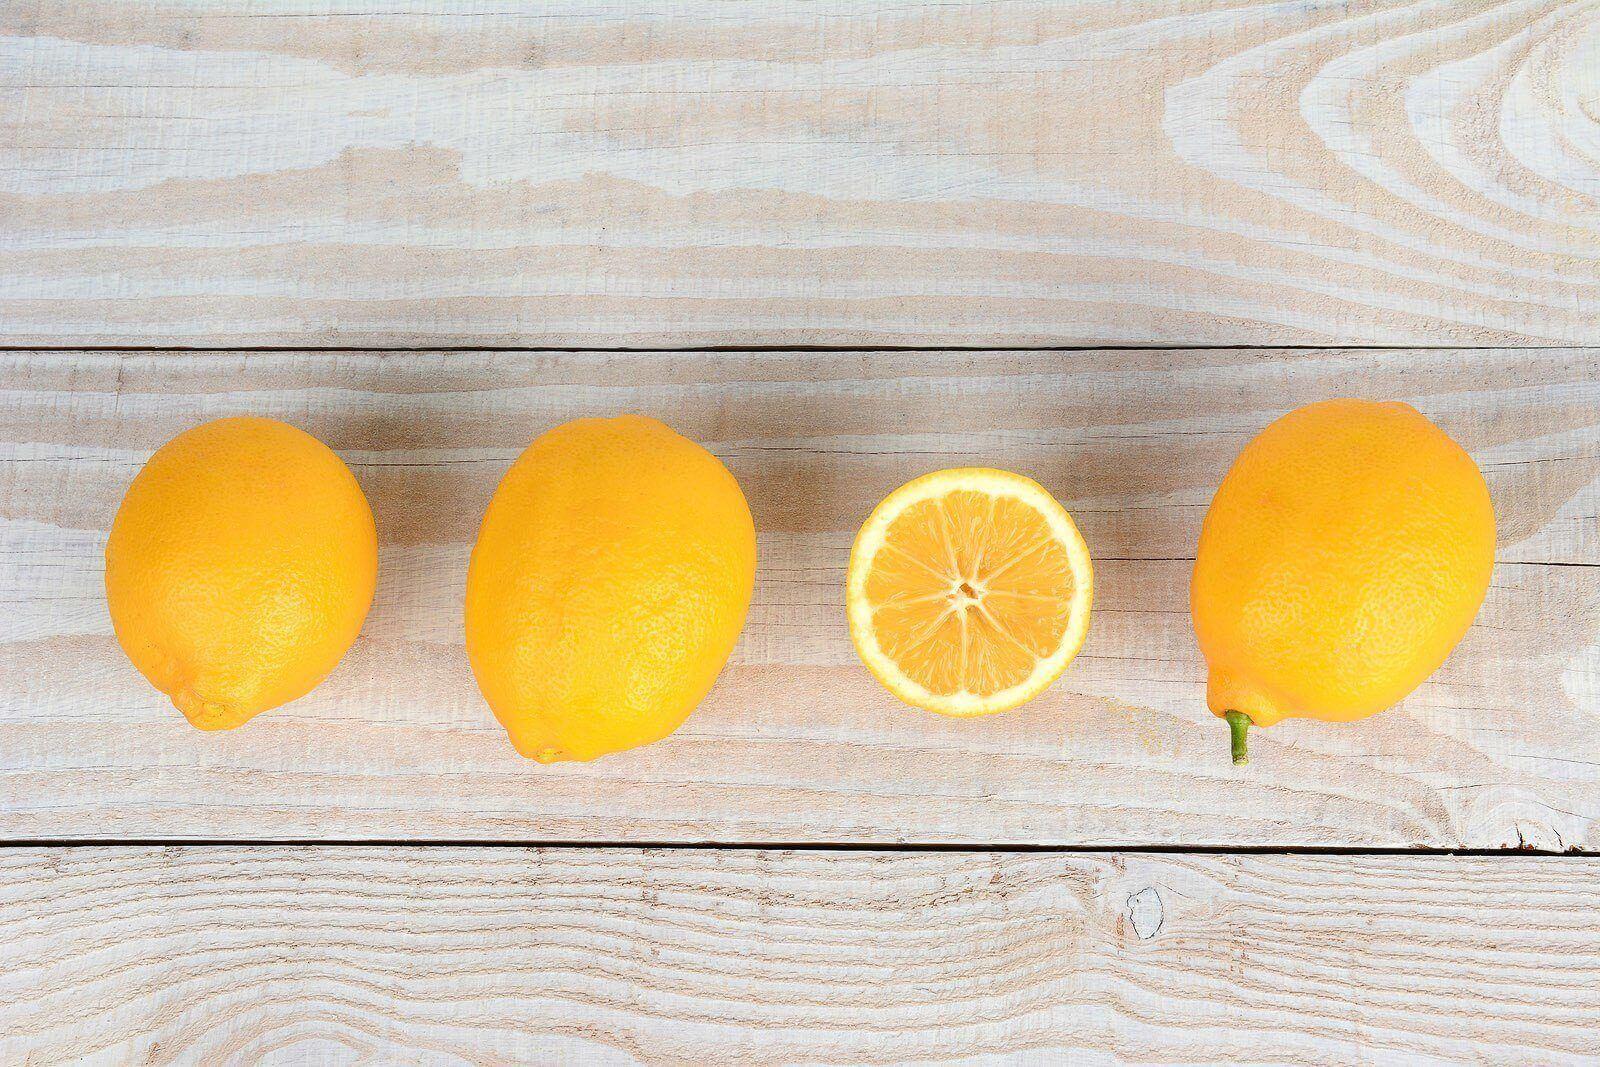 Increase lemon infusion intake